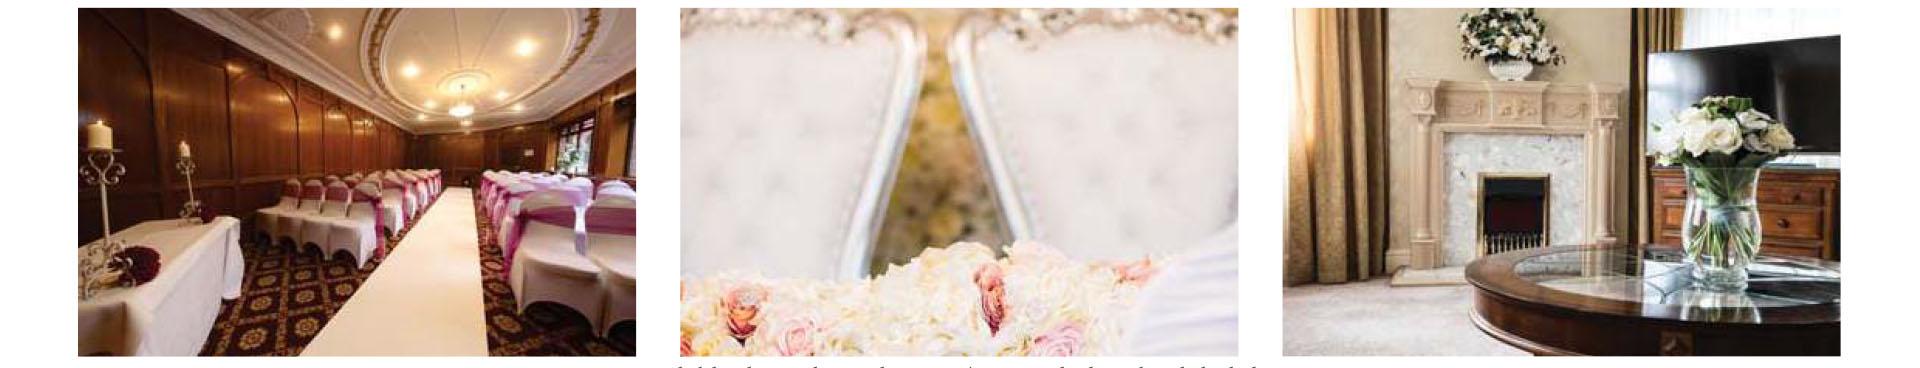 Twilight Wedding Package at Weddings Bredbury Hall Wedding Venue in Stockport Cheshire